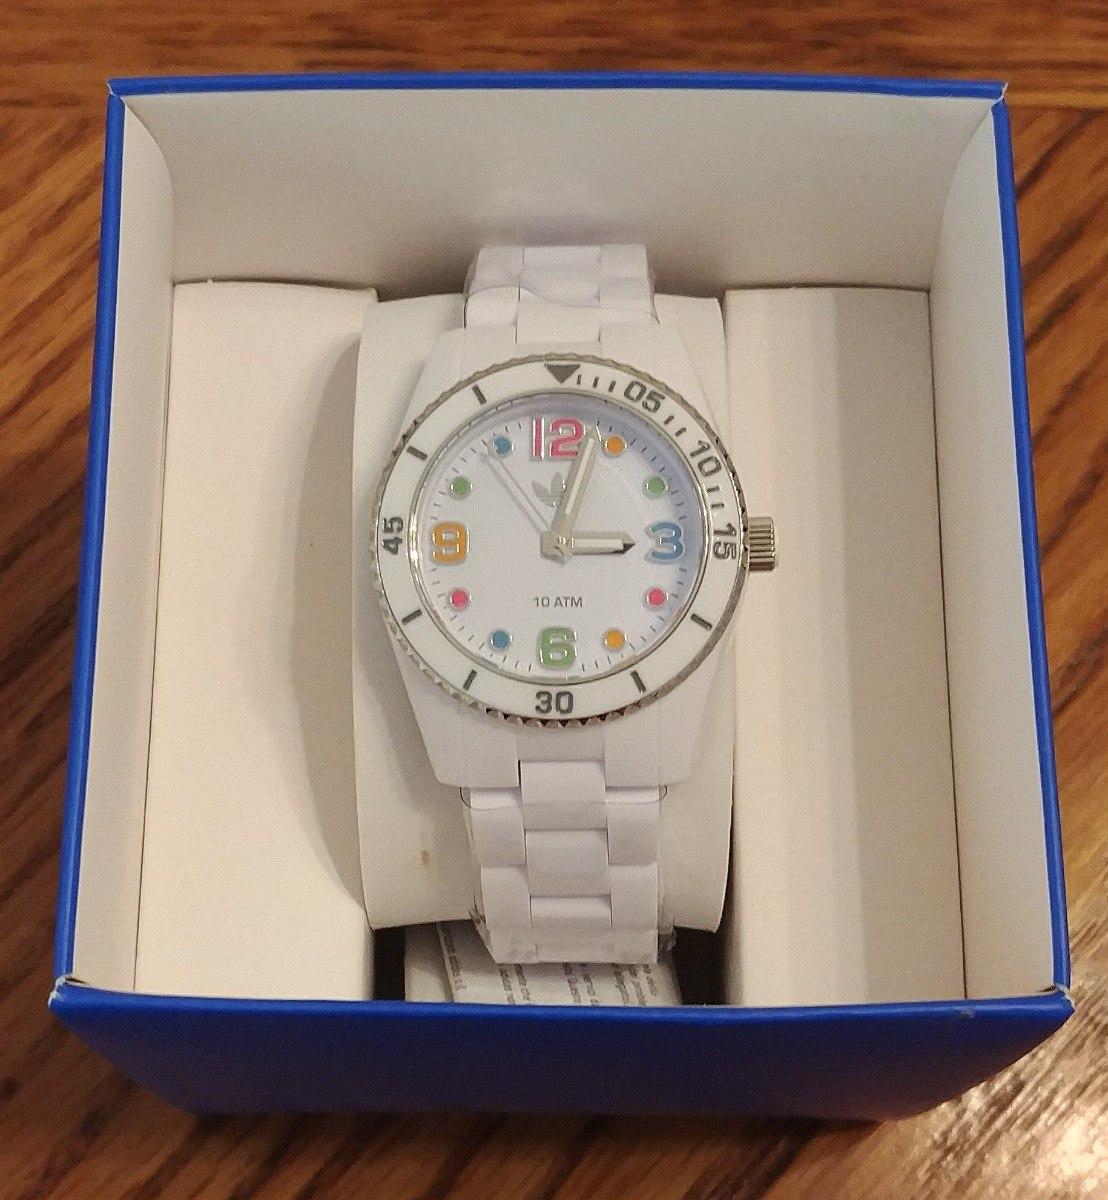 El Ingles Reloj Adidas Corte Adh2941 c5ALjS34qR